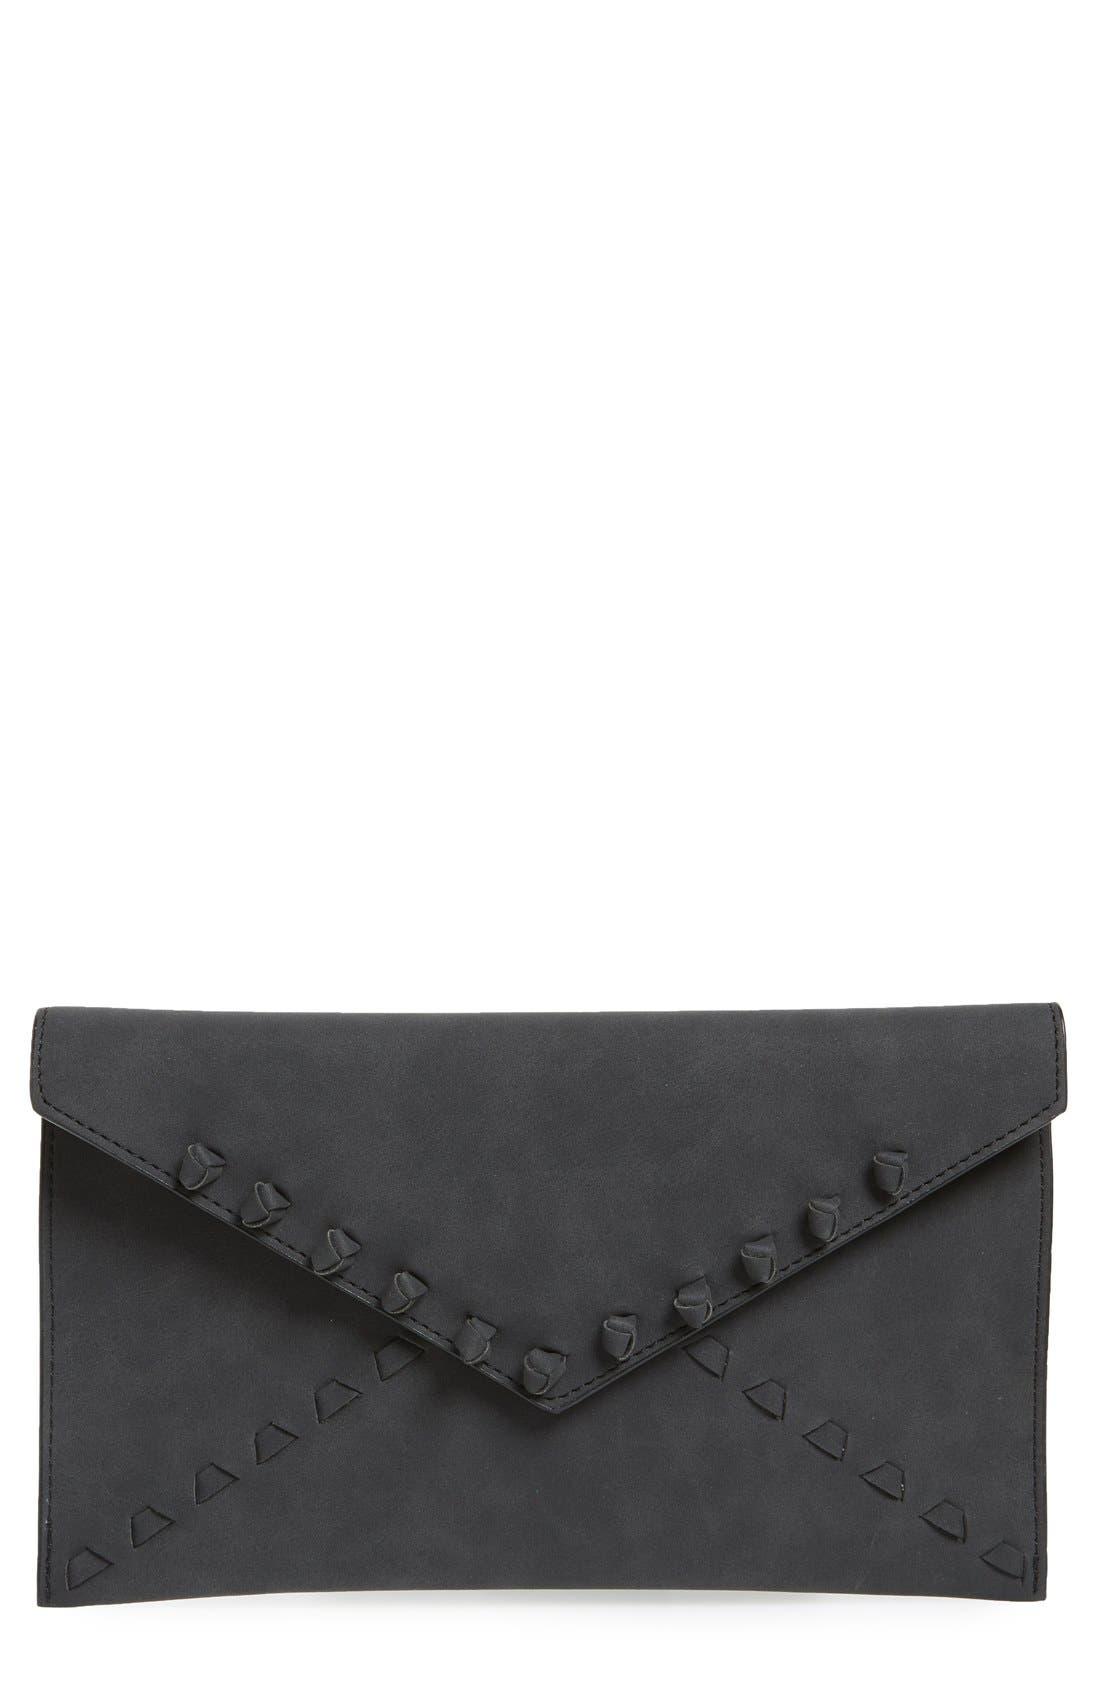 Main Image - Danielle Nicole 'Tina' Faux Leather Envelope Clutch